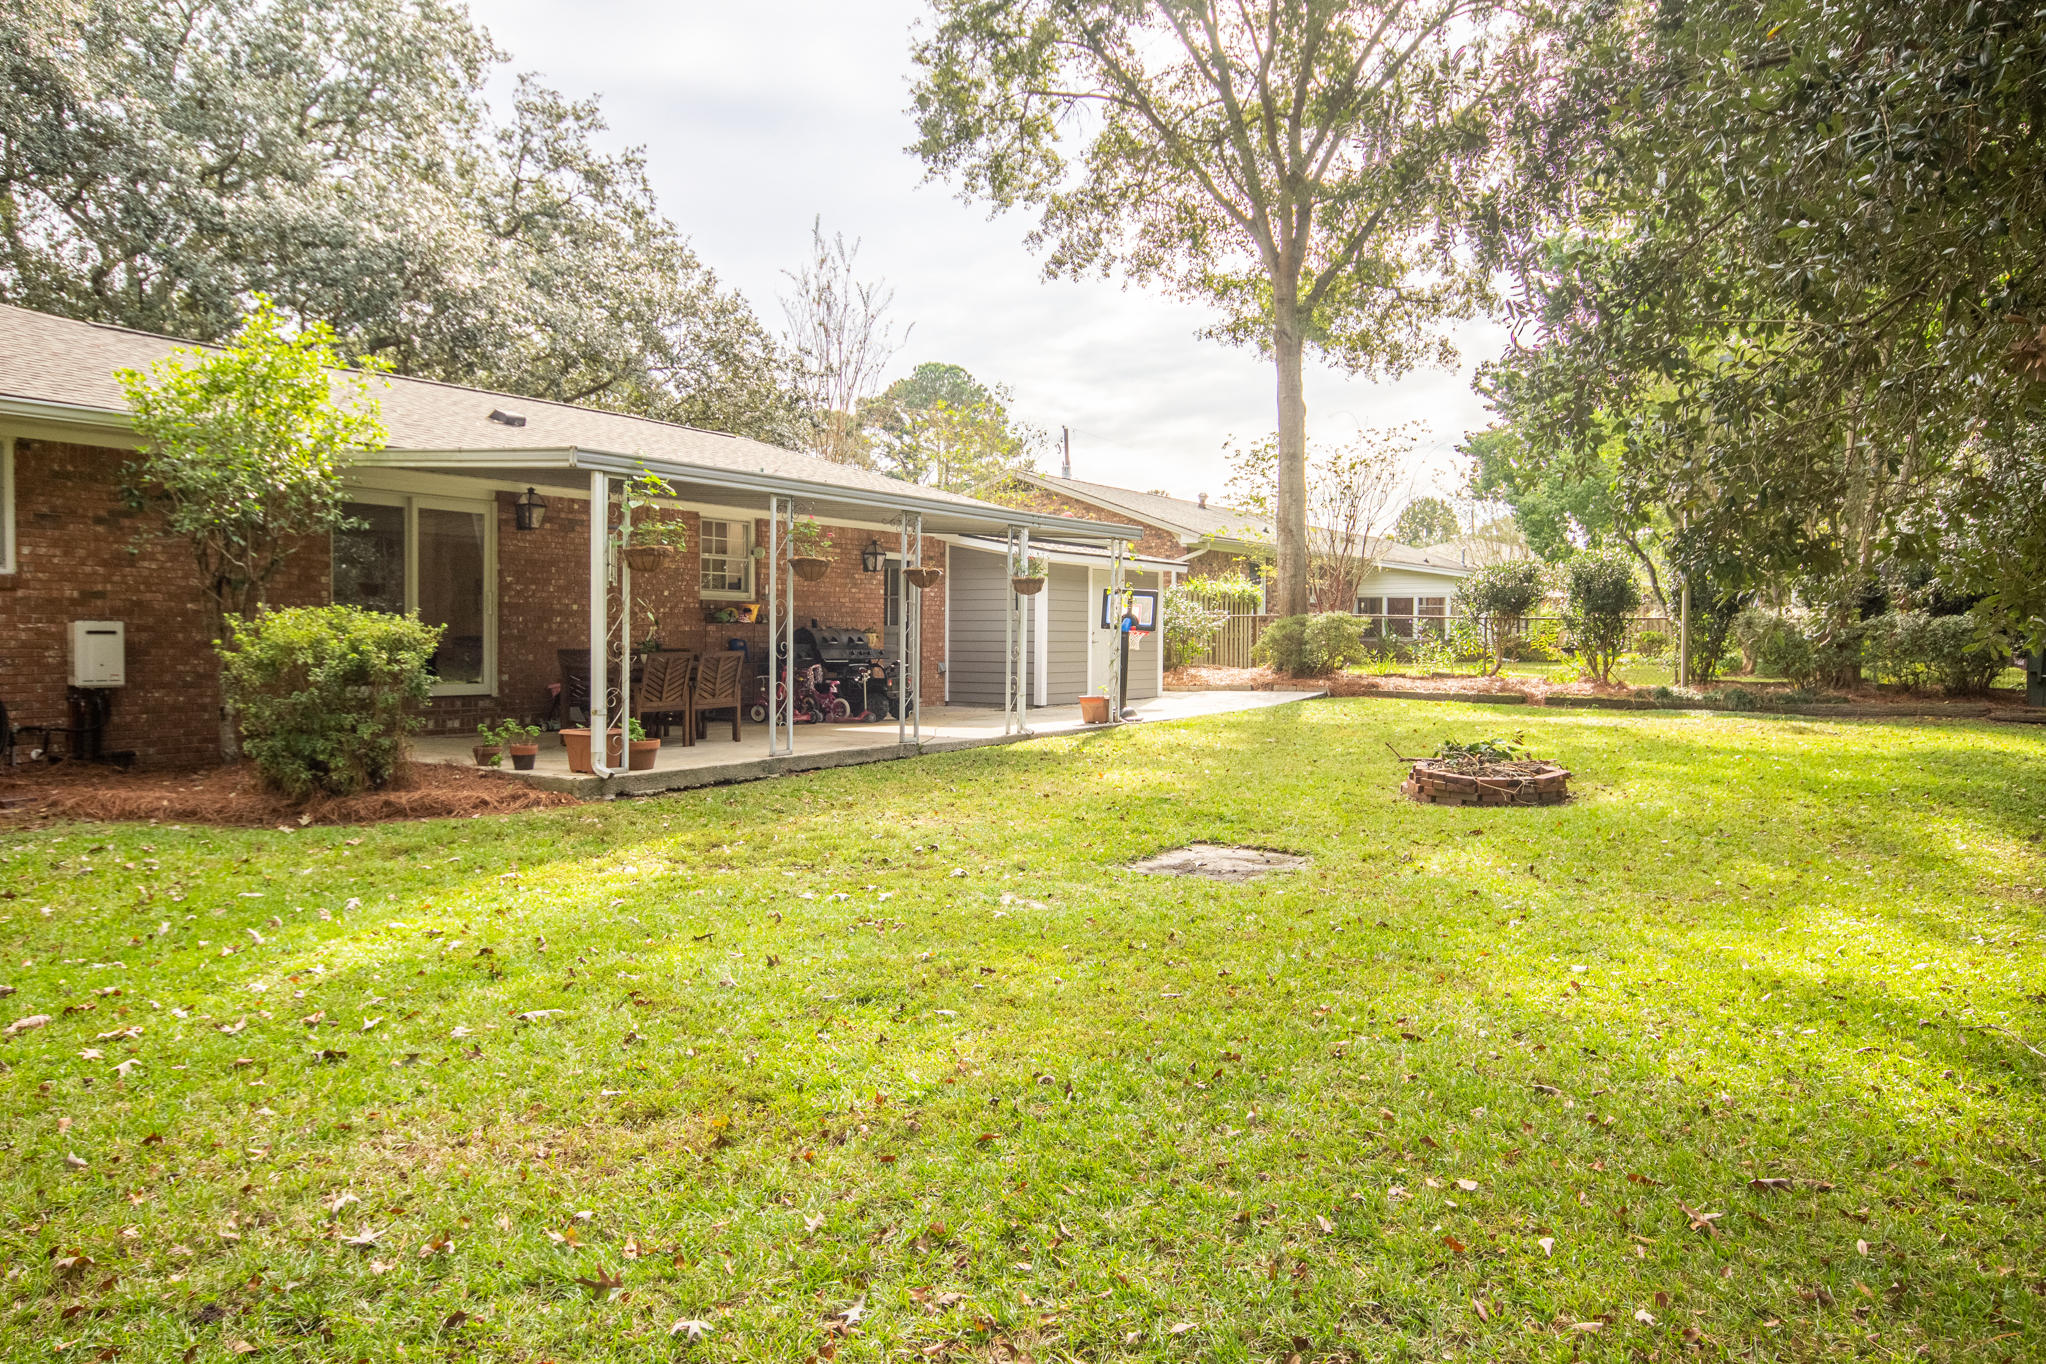 Belvedere Estates Homes For Sale - 6021 Rembert, Hanahan, SC - 27